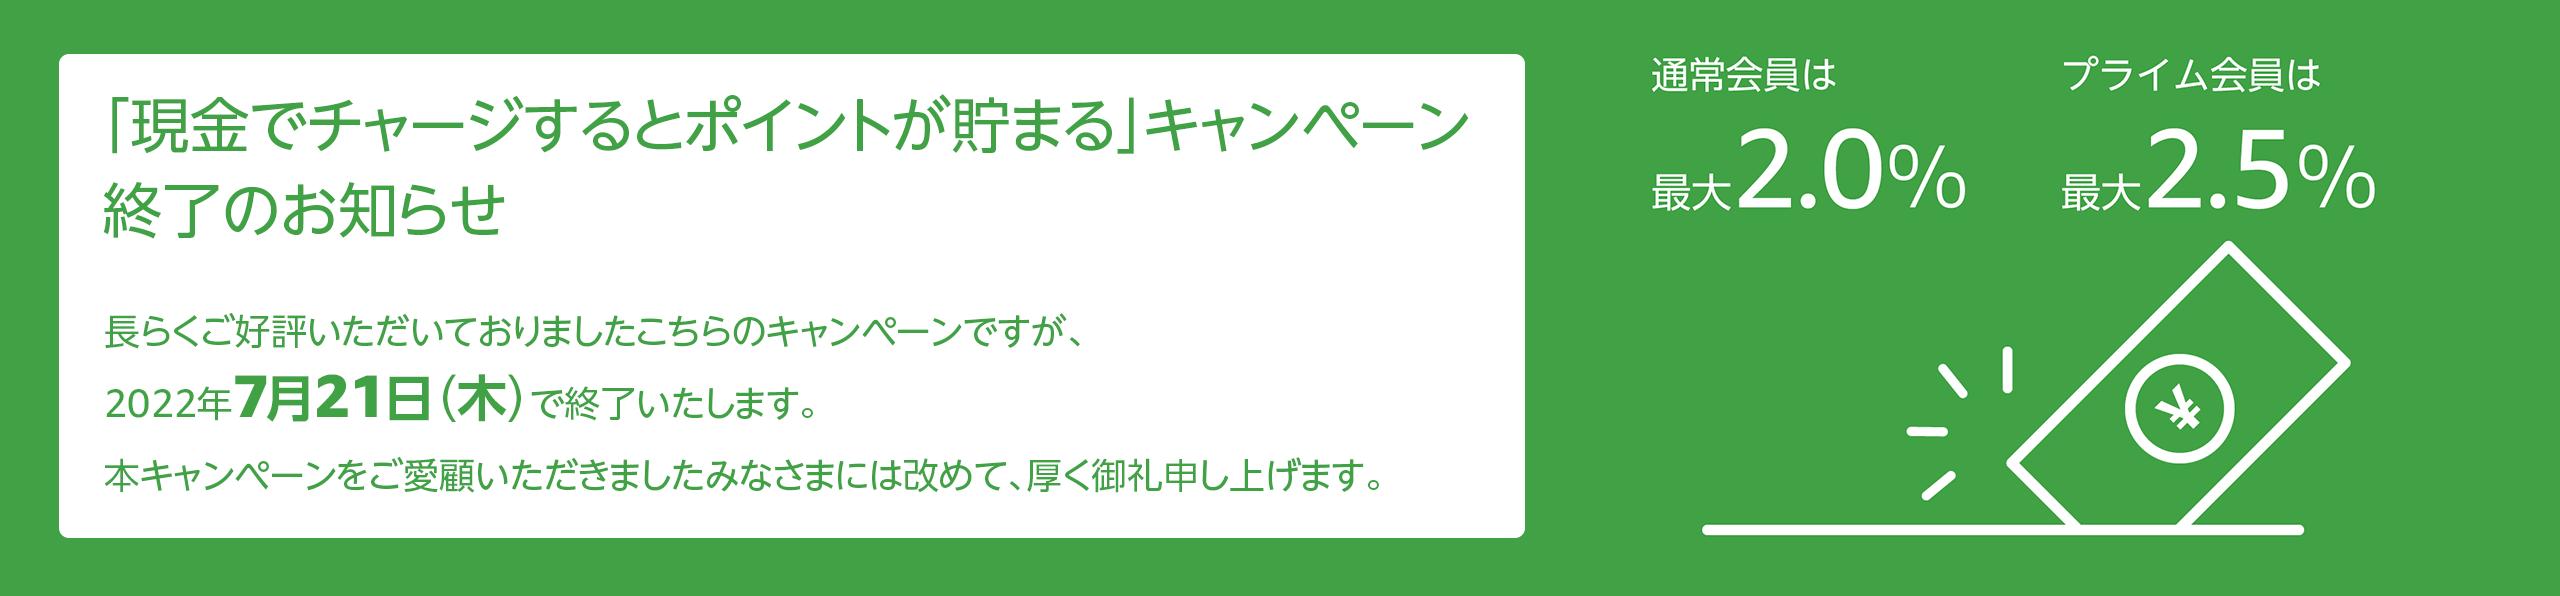 max 2.5%